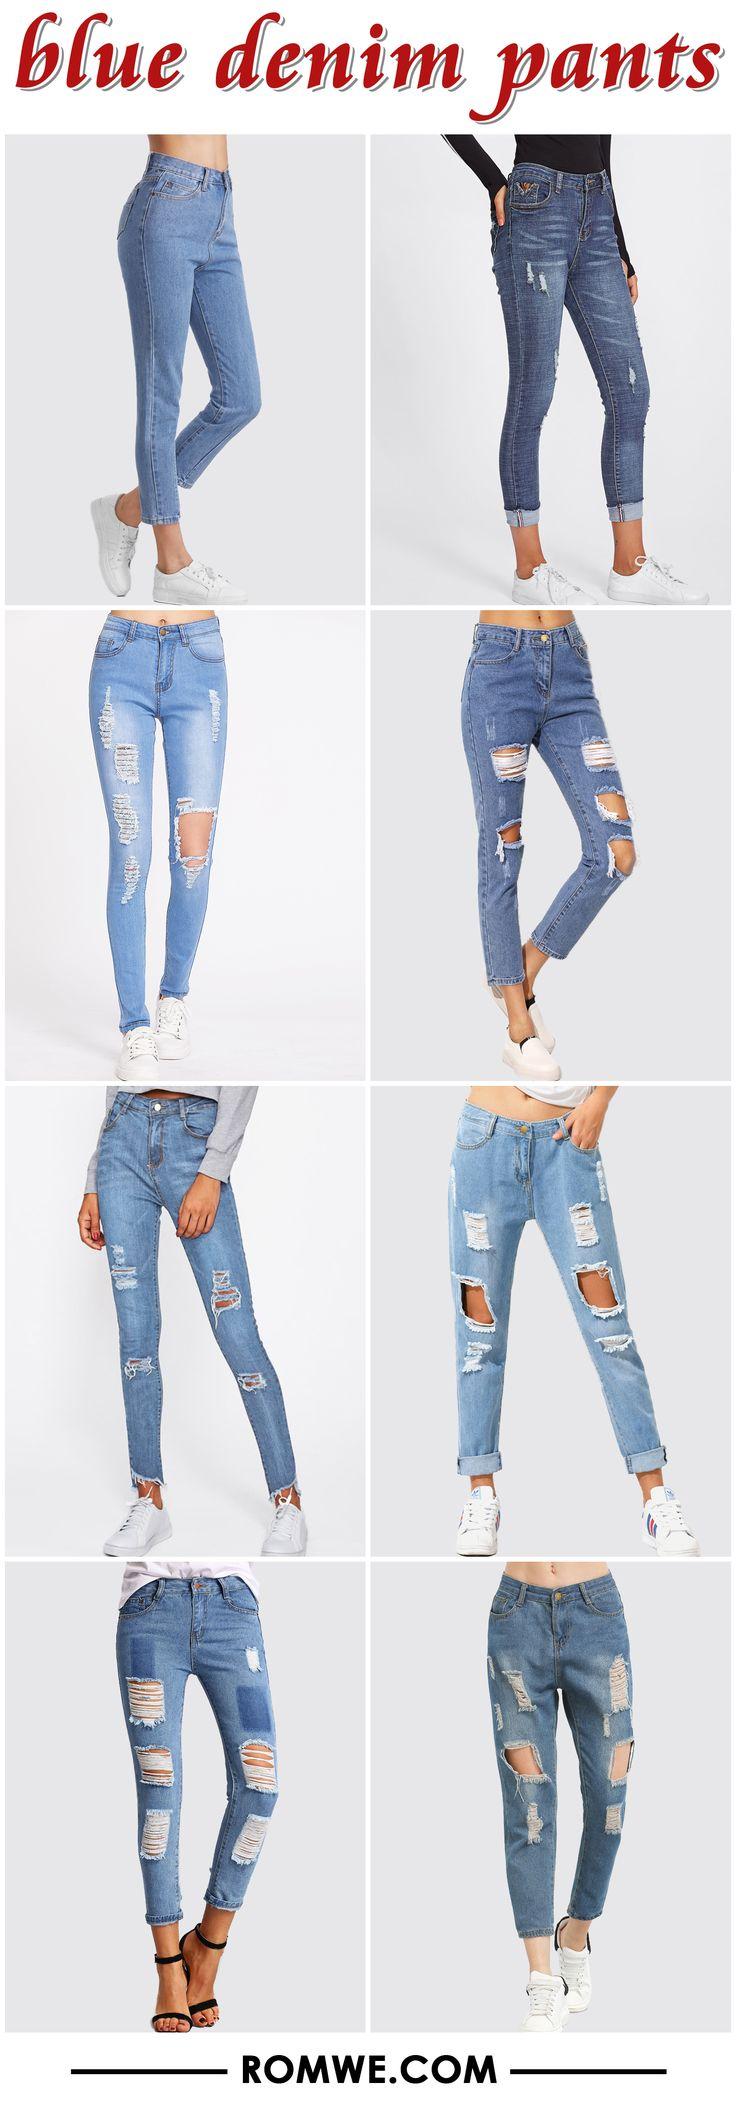 blue denim pants from romwe.com